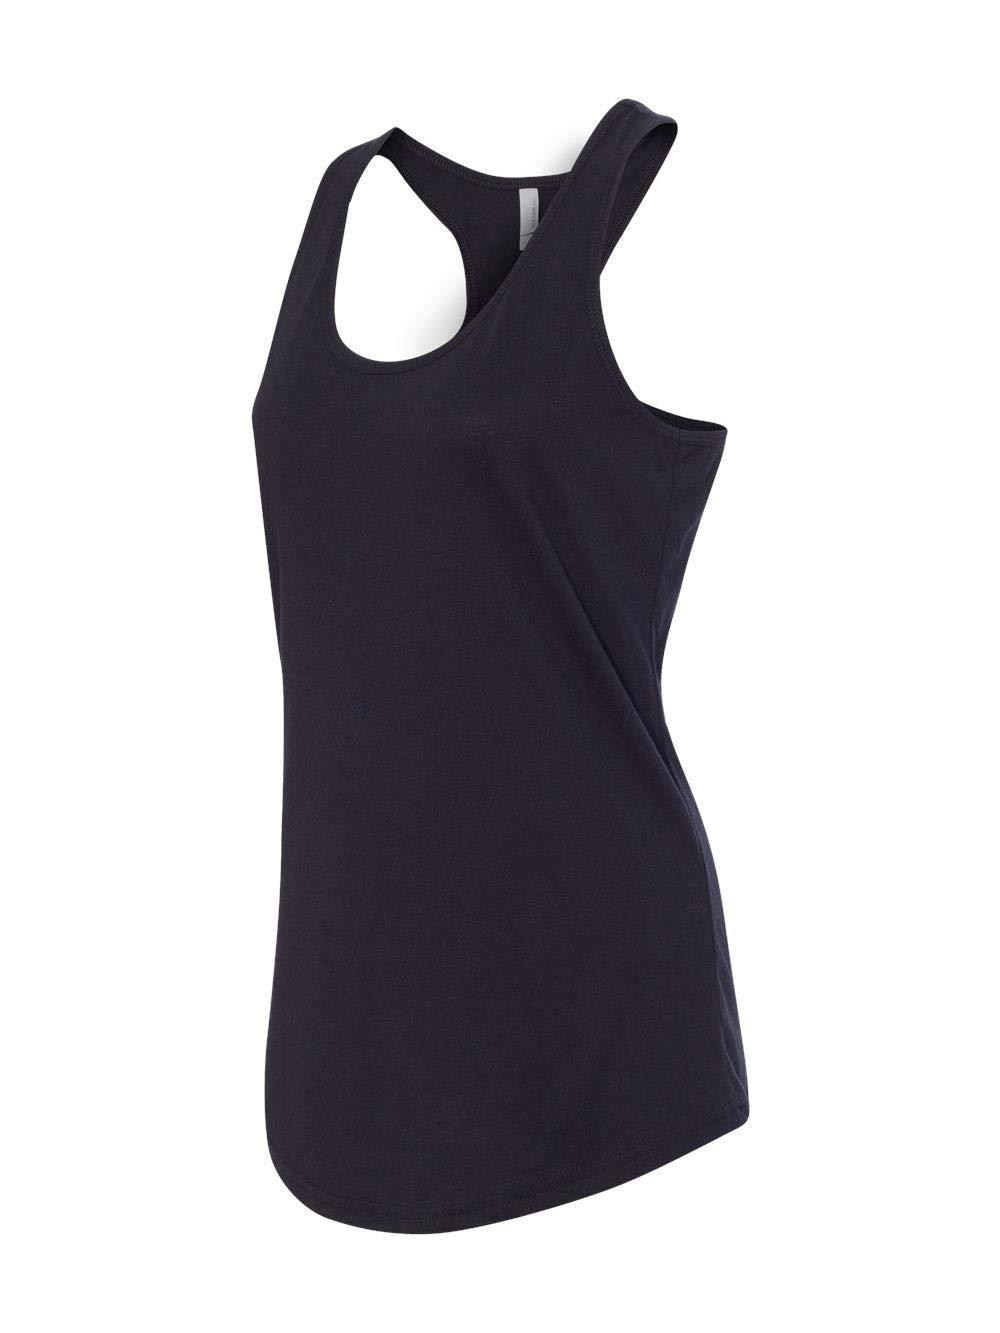 Next Level Apparel Women's Tear-Away Tank Top, Black, Medium